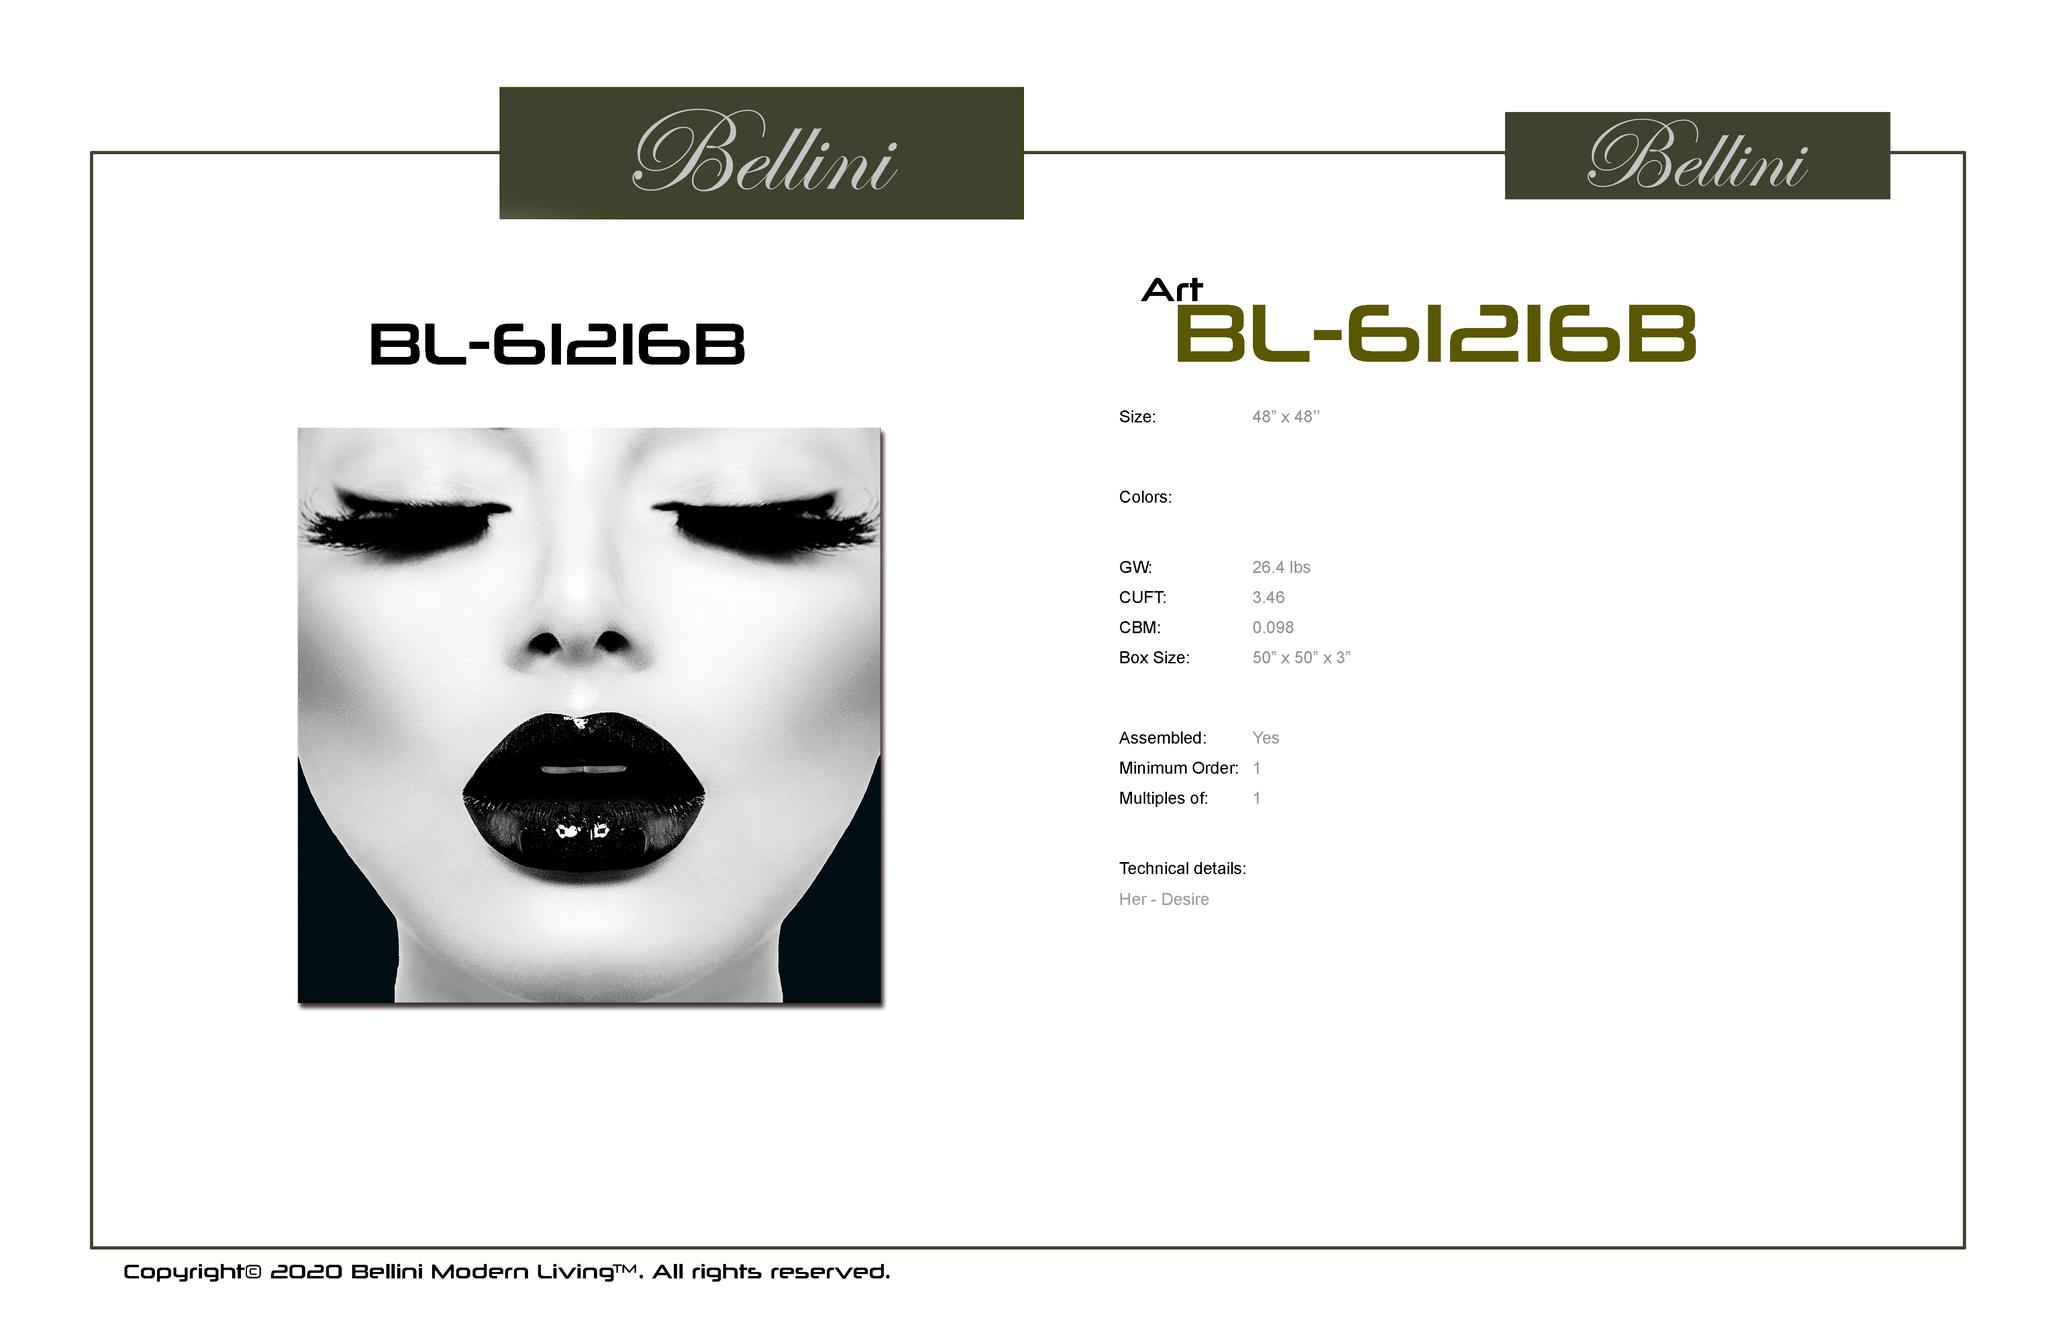 BL-61216B